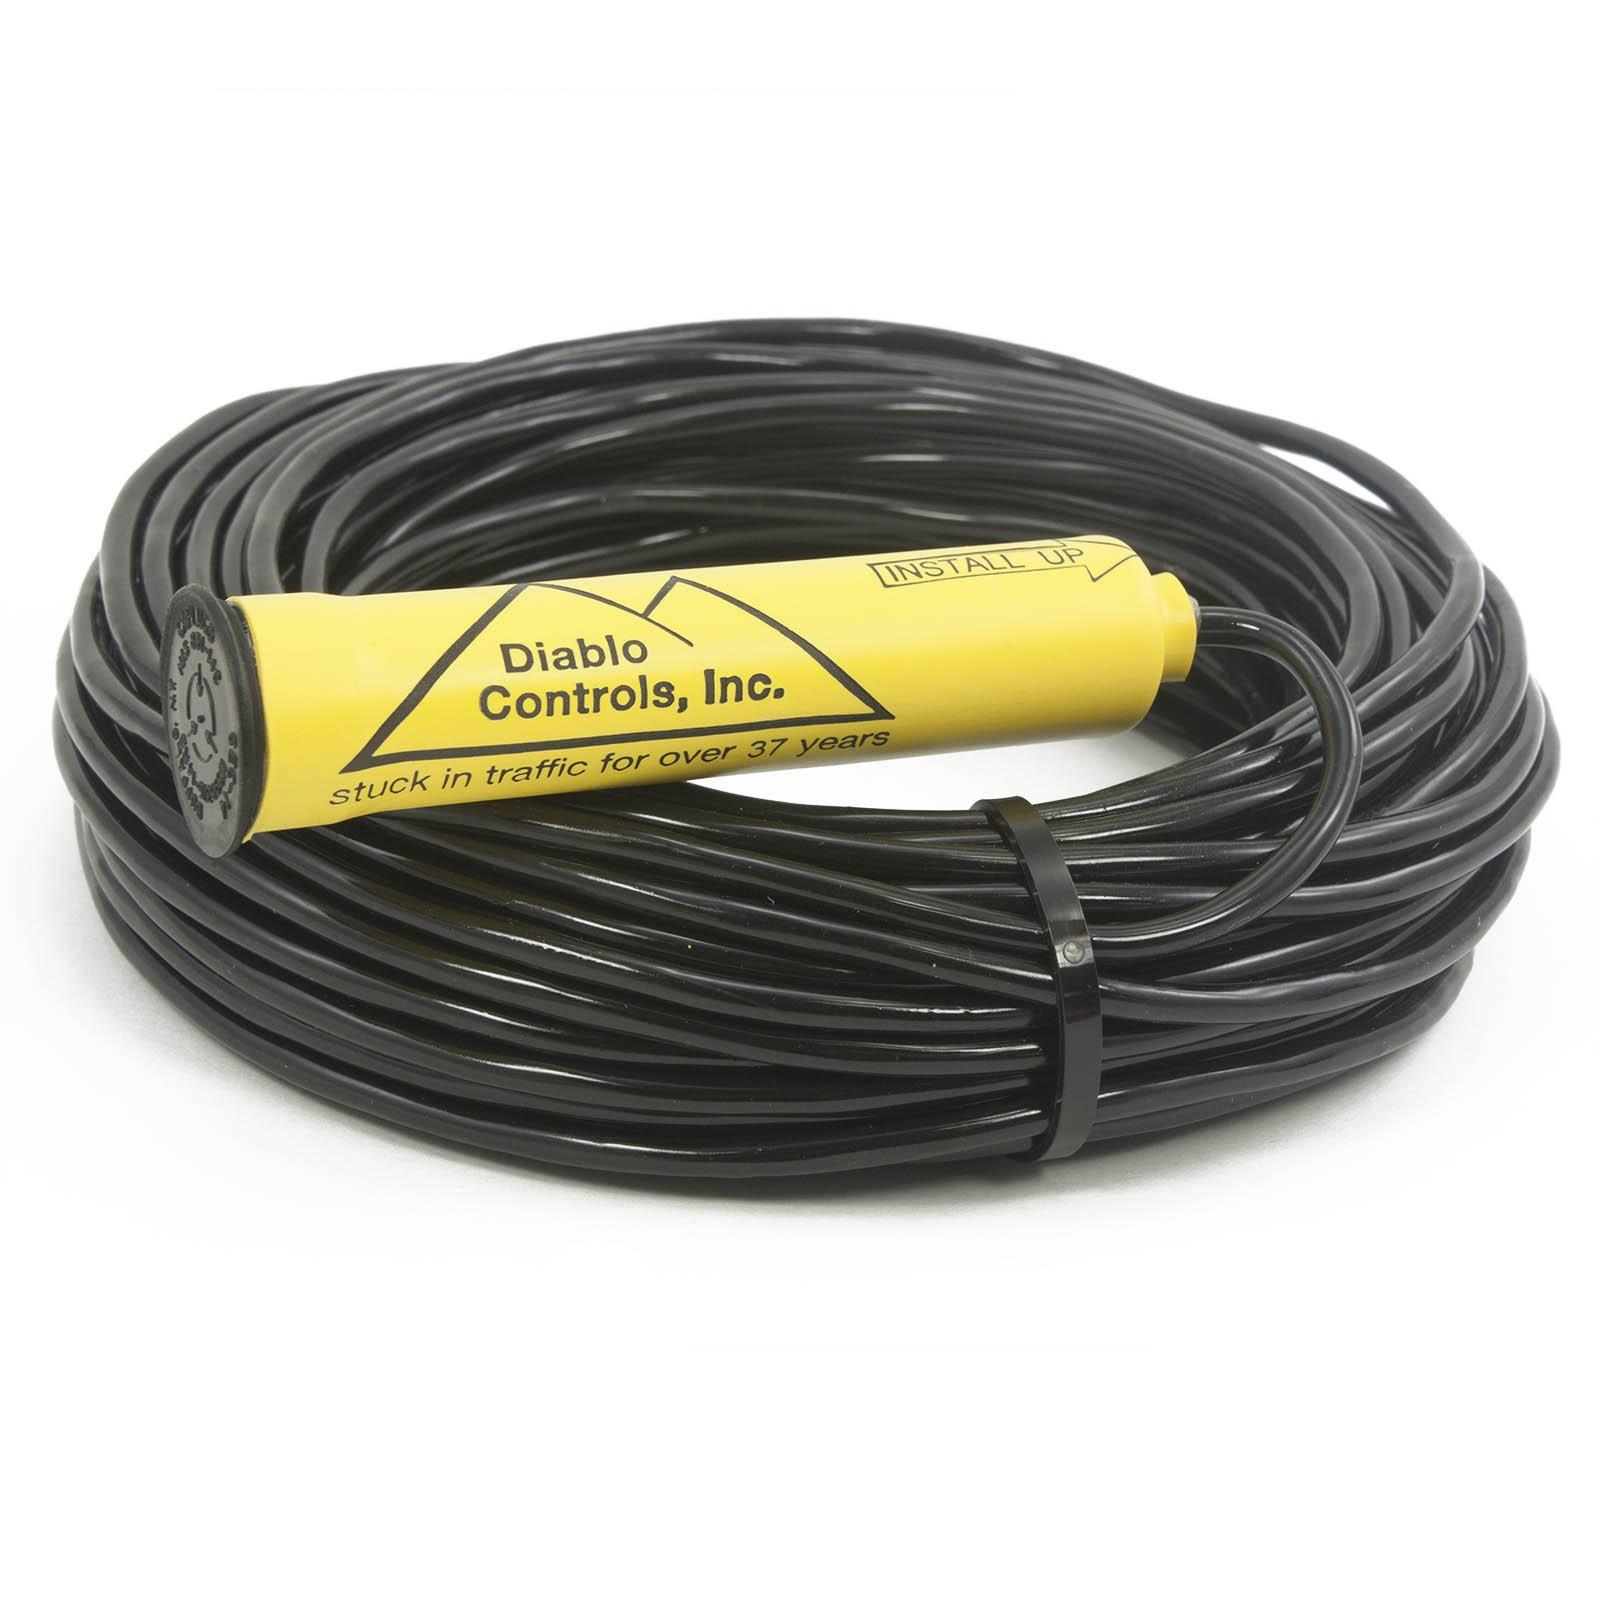 on ahv280bt pioneer wiring harness color code